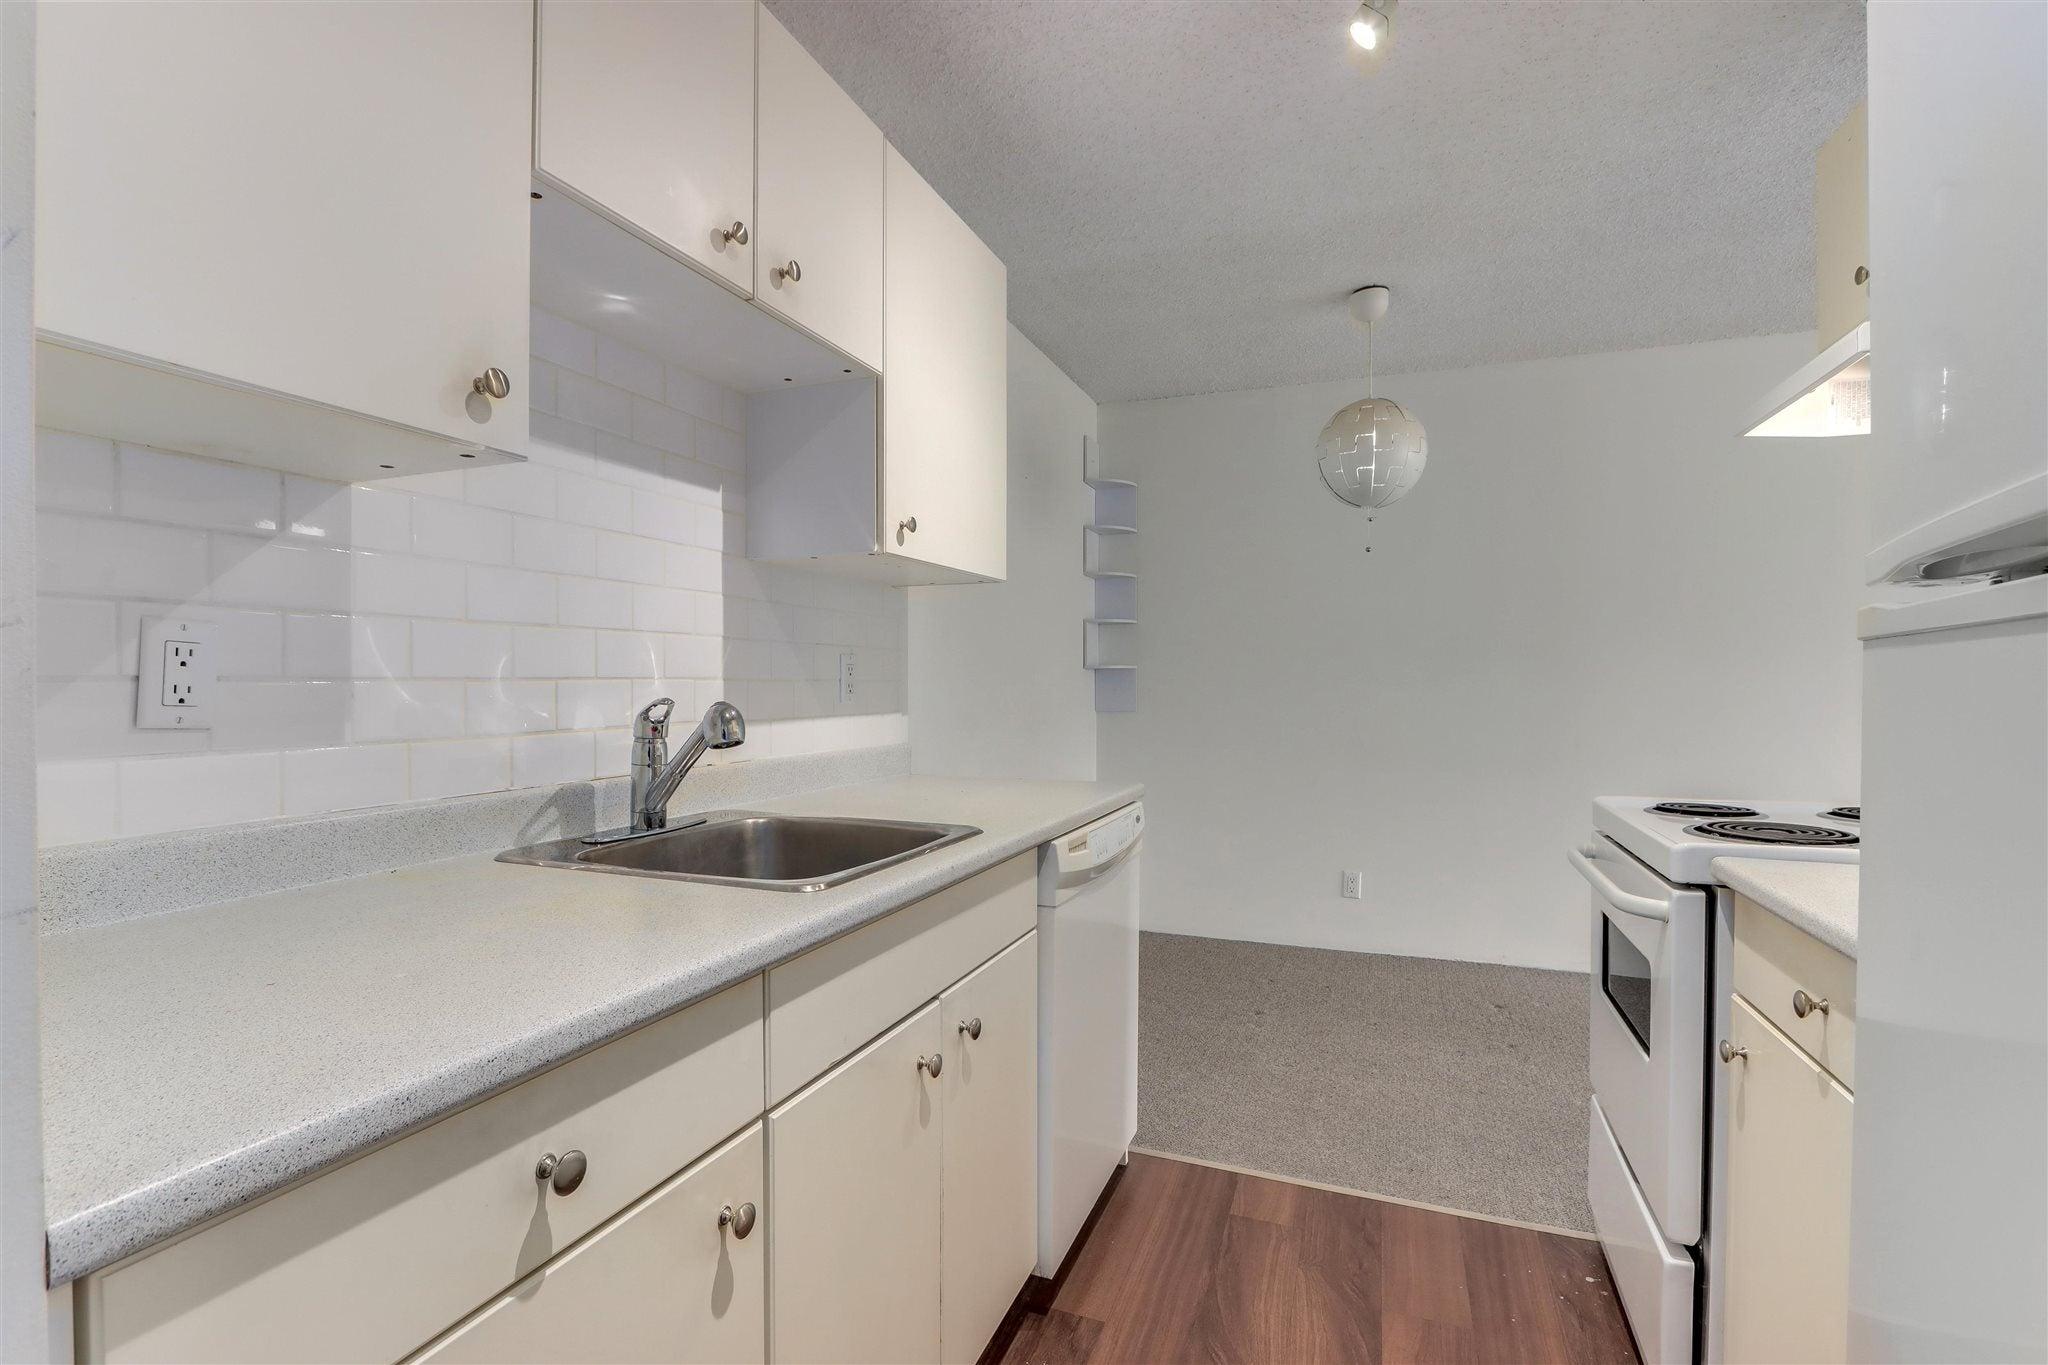 1018 2012 FULLERTON AVENUE - Pemberton NV Apartment/Condo for sale, 1 Bedroom (R2594277) - #1